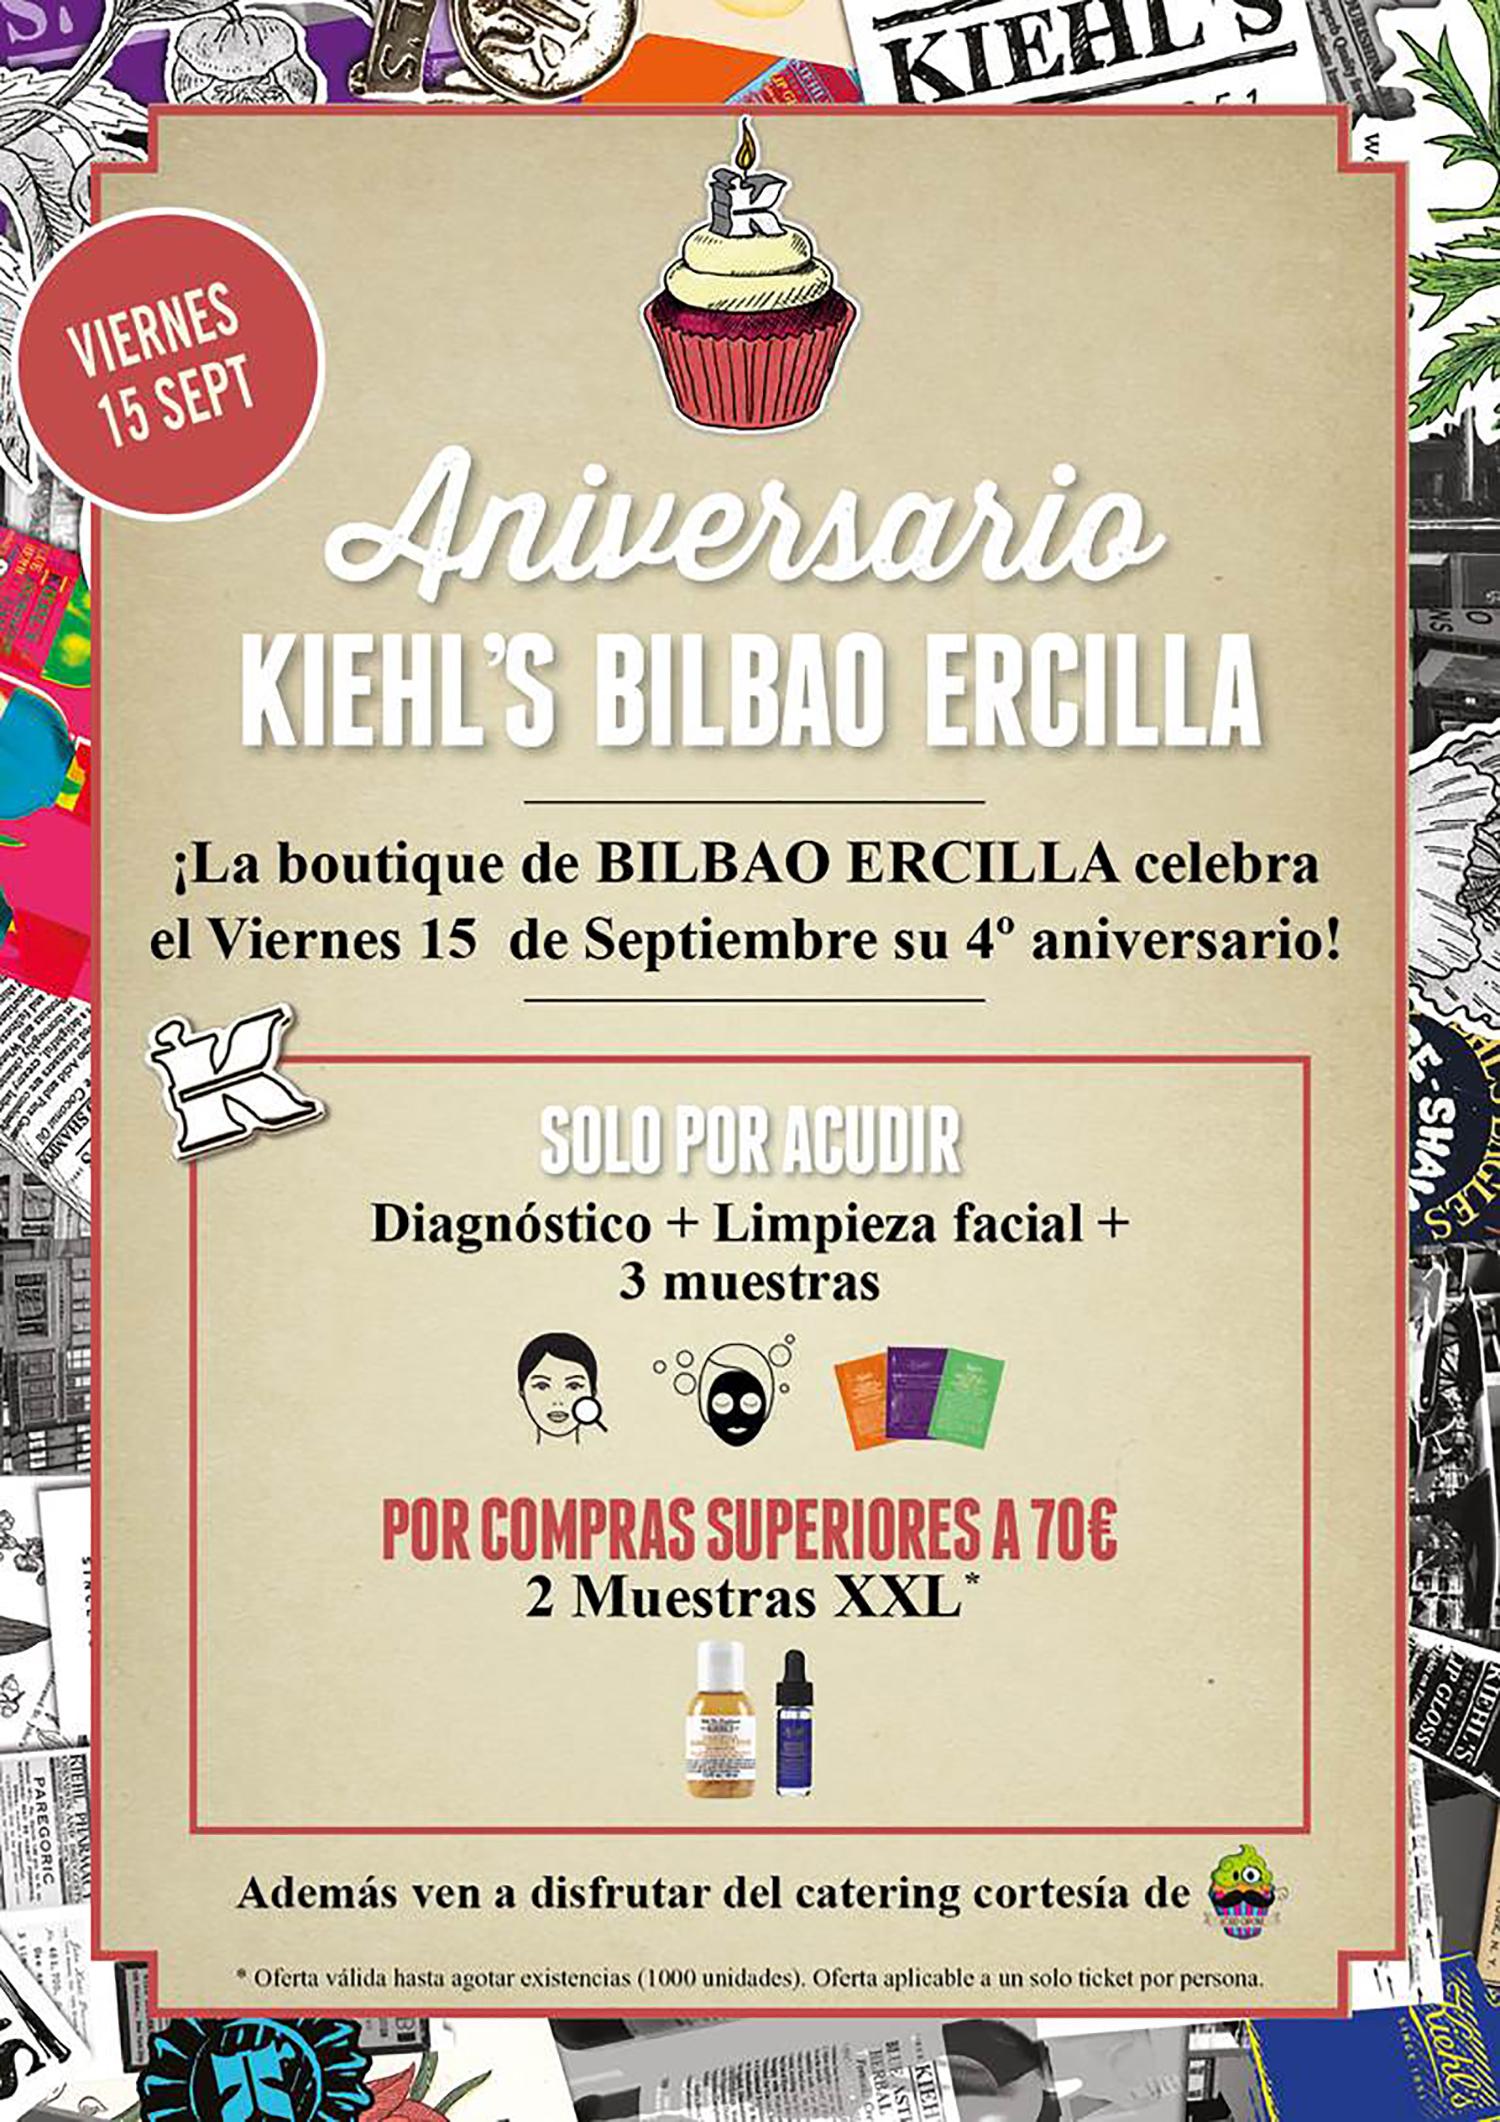 Kiehl's Bilbao Ercilla